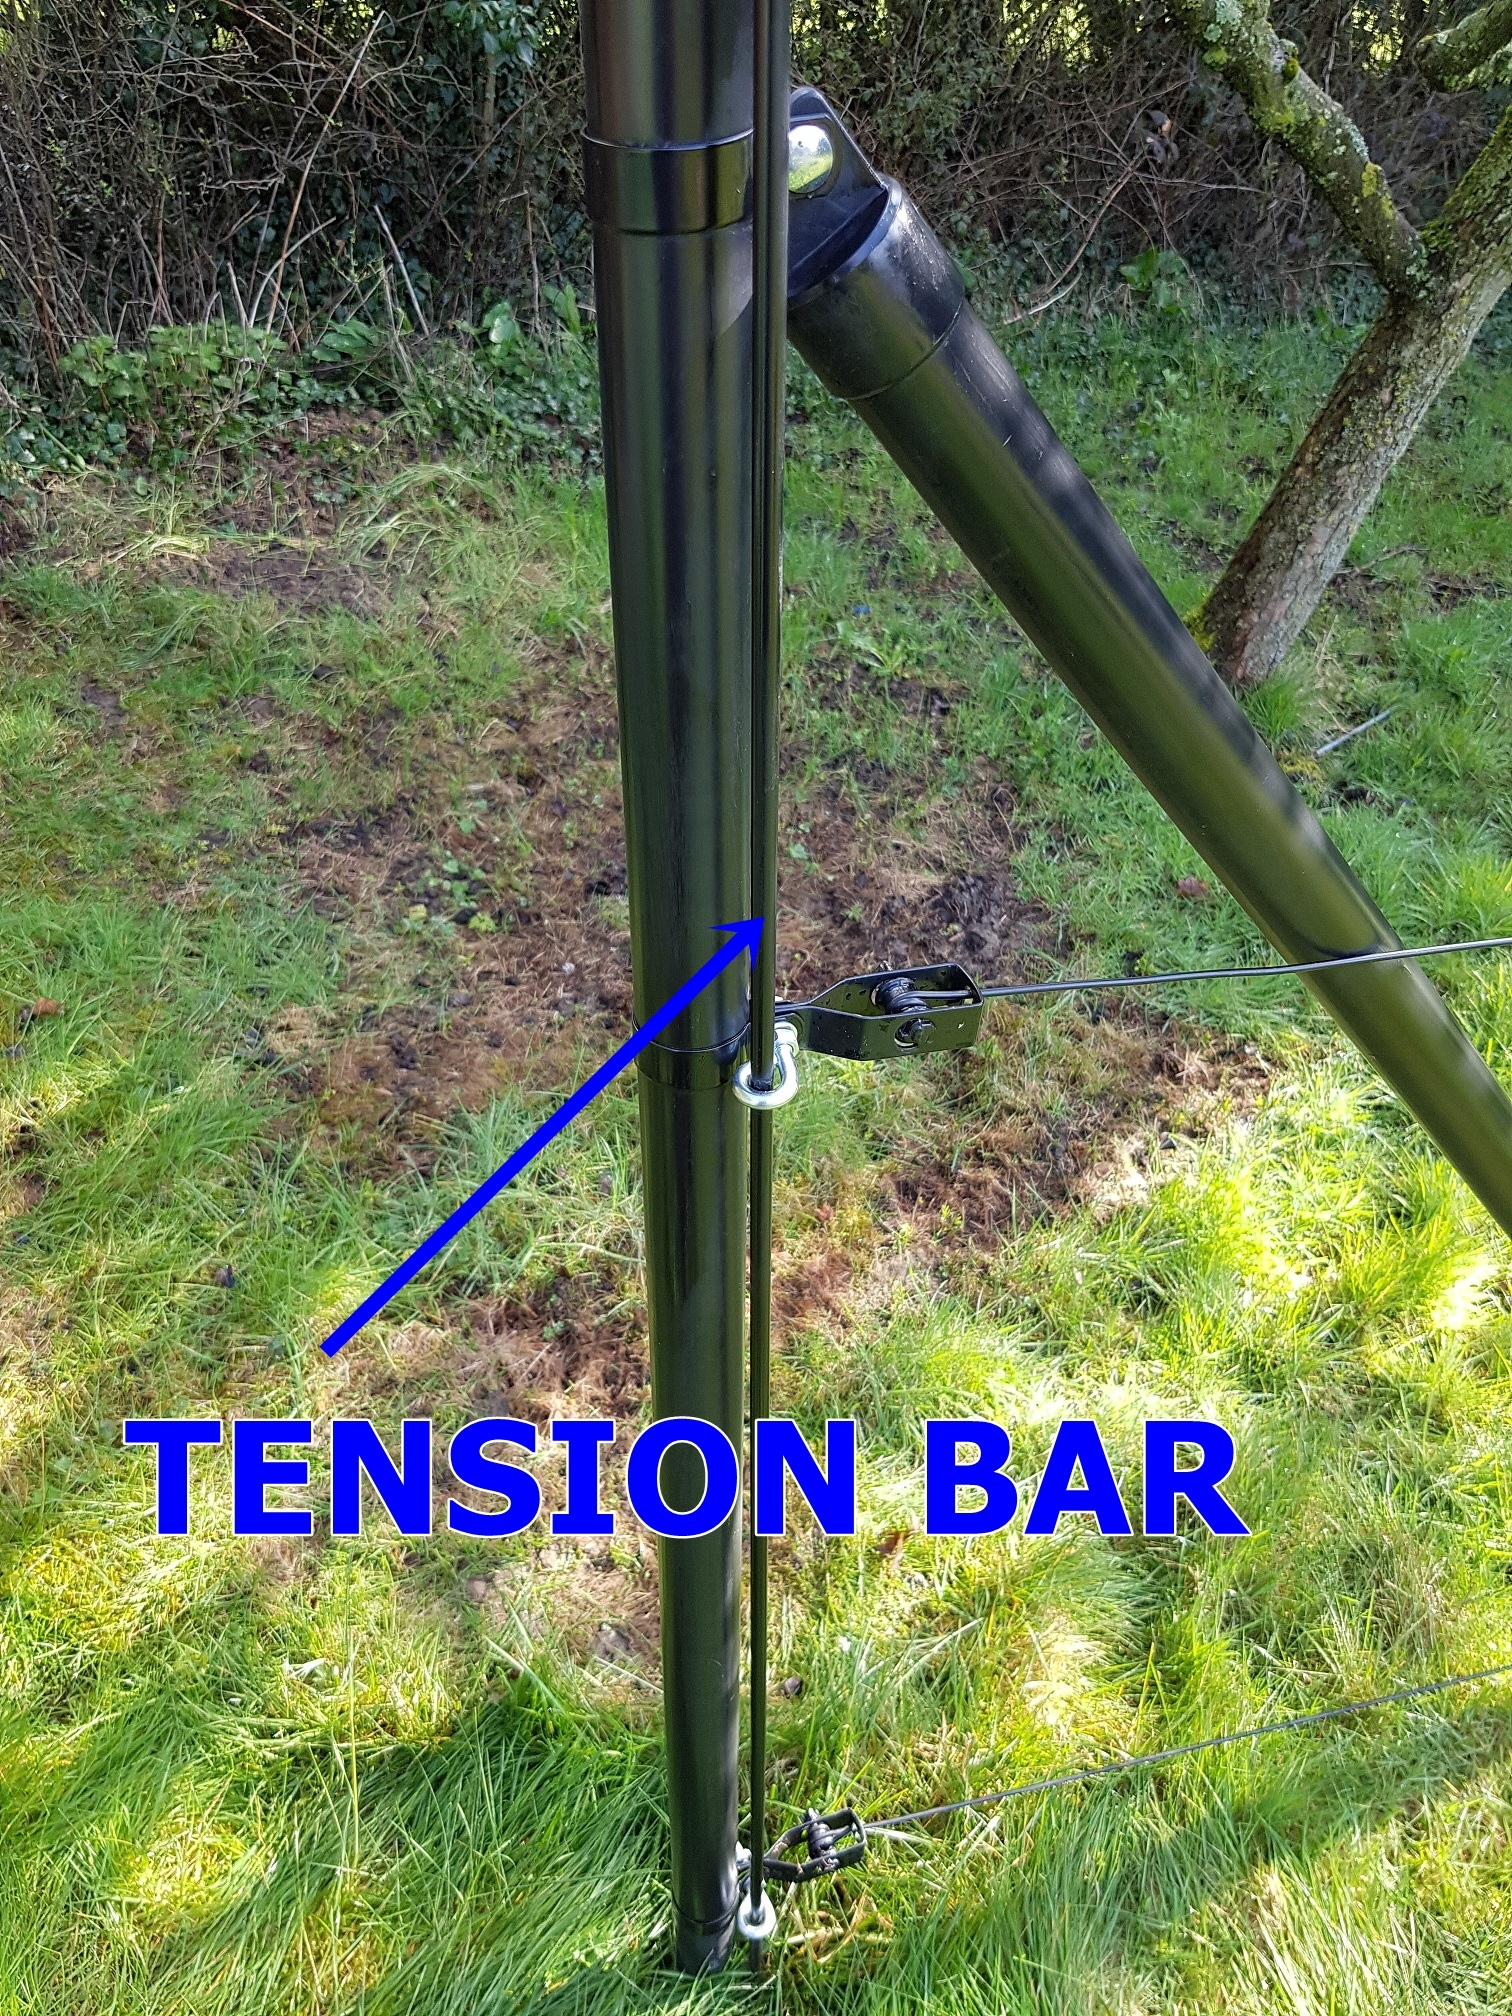 TENSION BAR